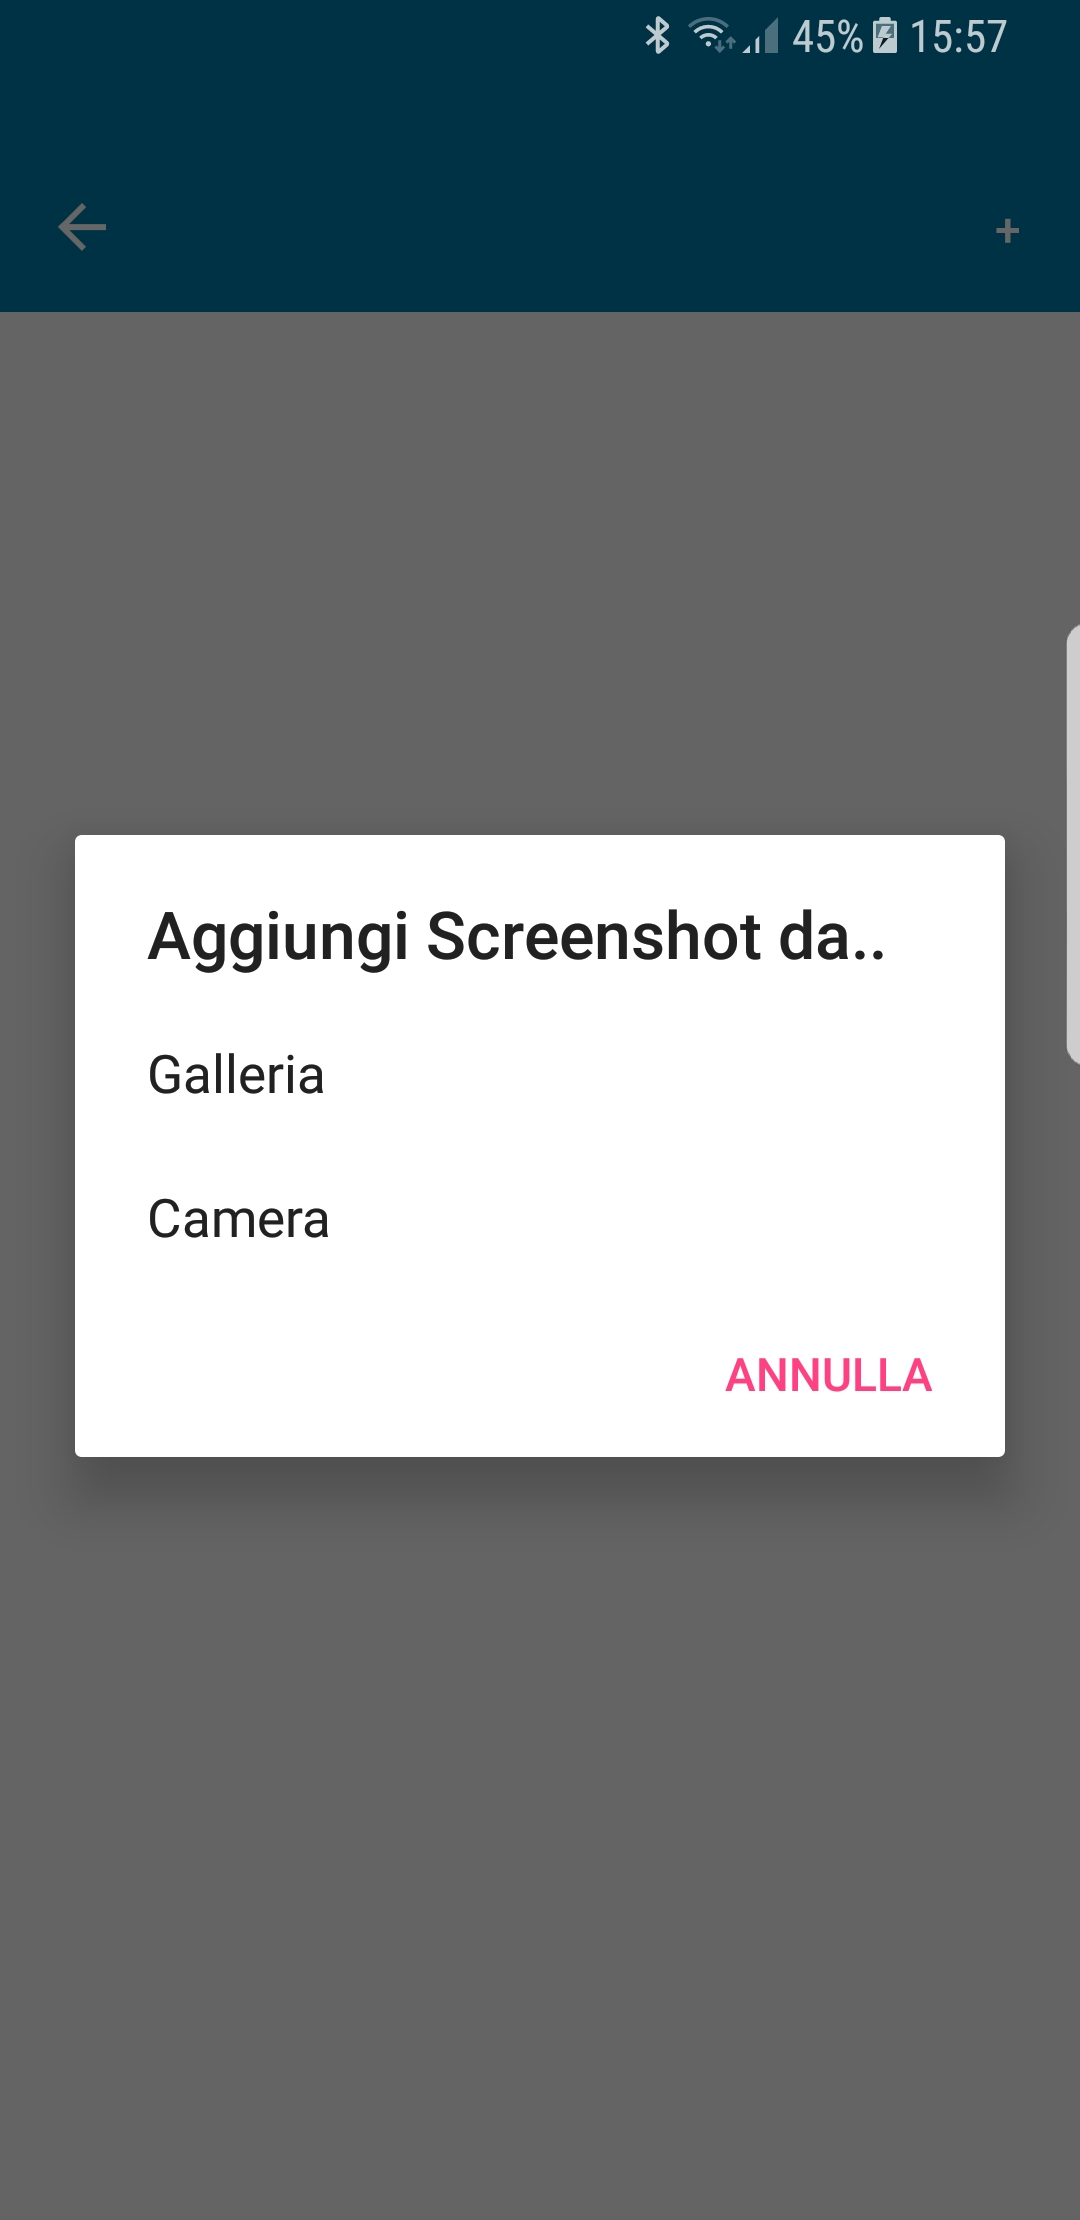 Server Mate app - aggiungi screen